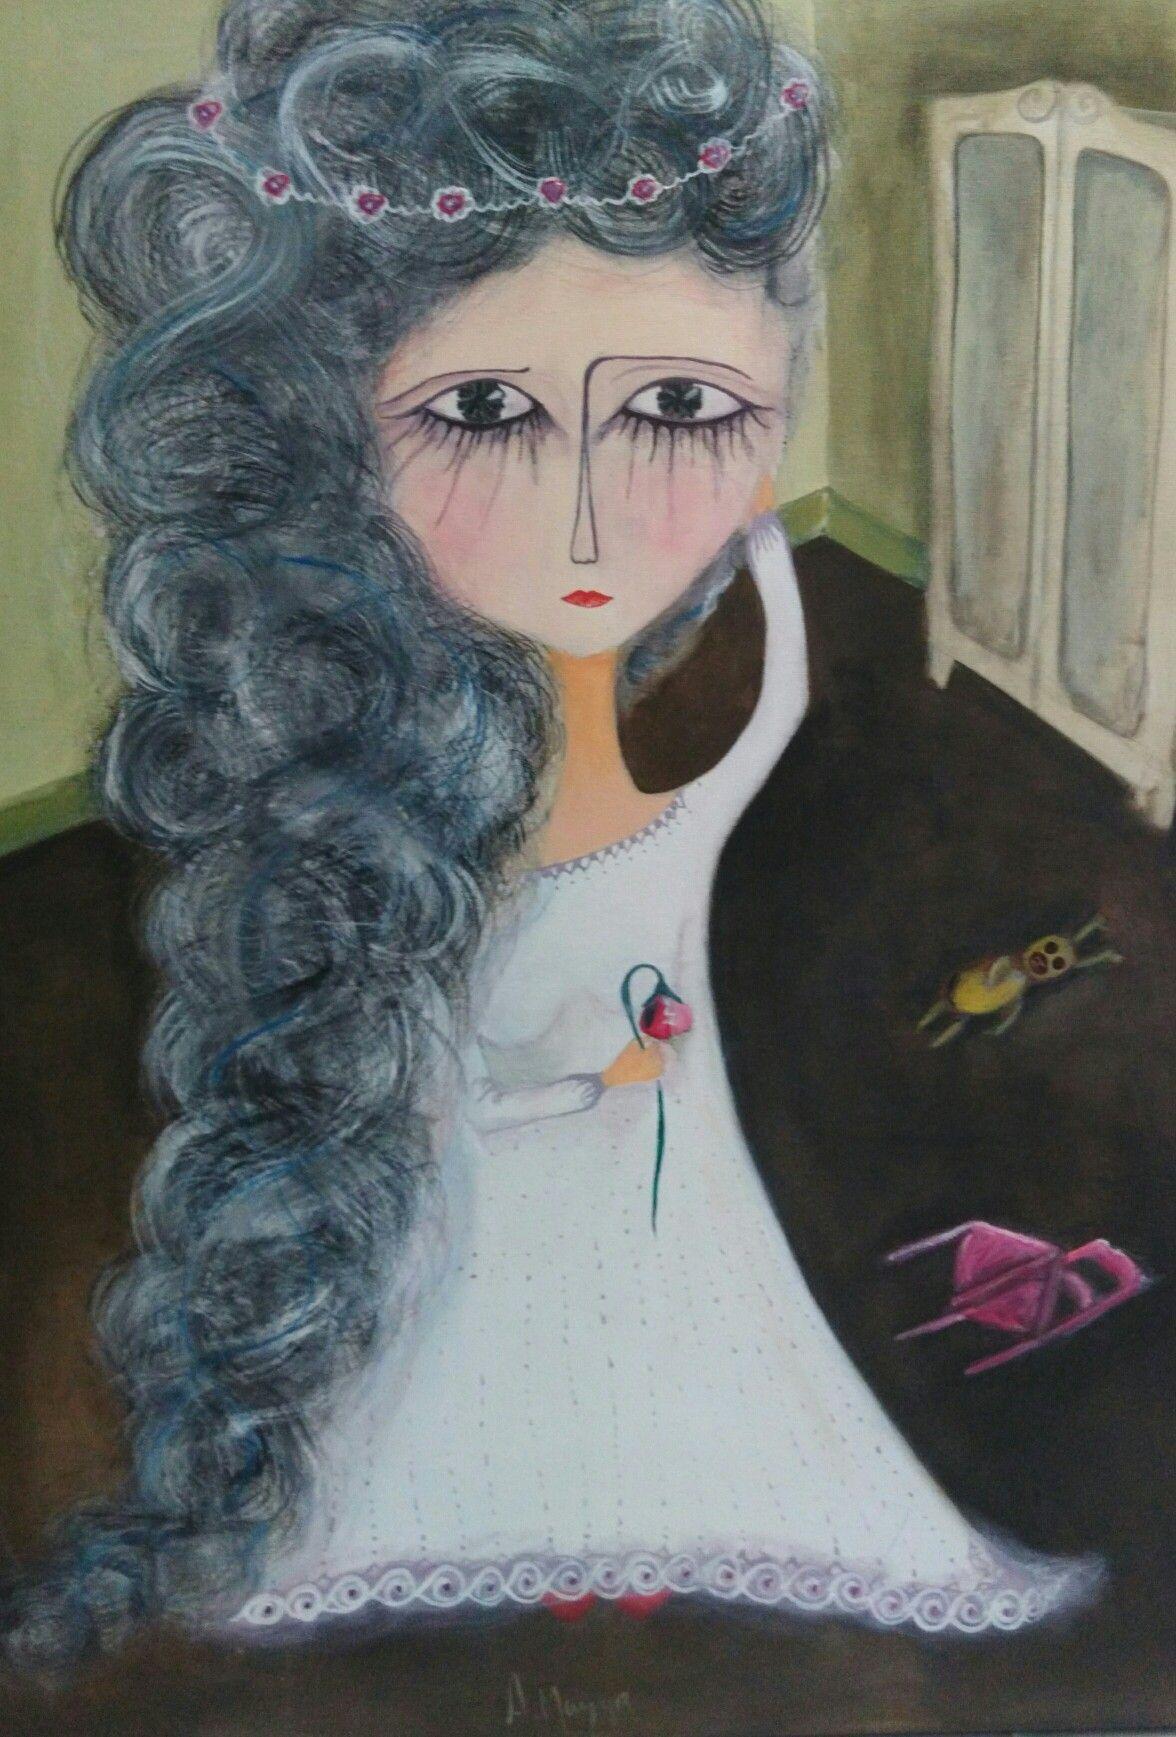 Alejandra mazza Desdichada Acrílico s/tela 70x50 cm 2016